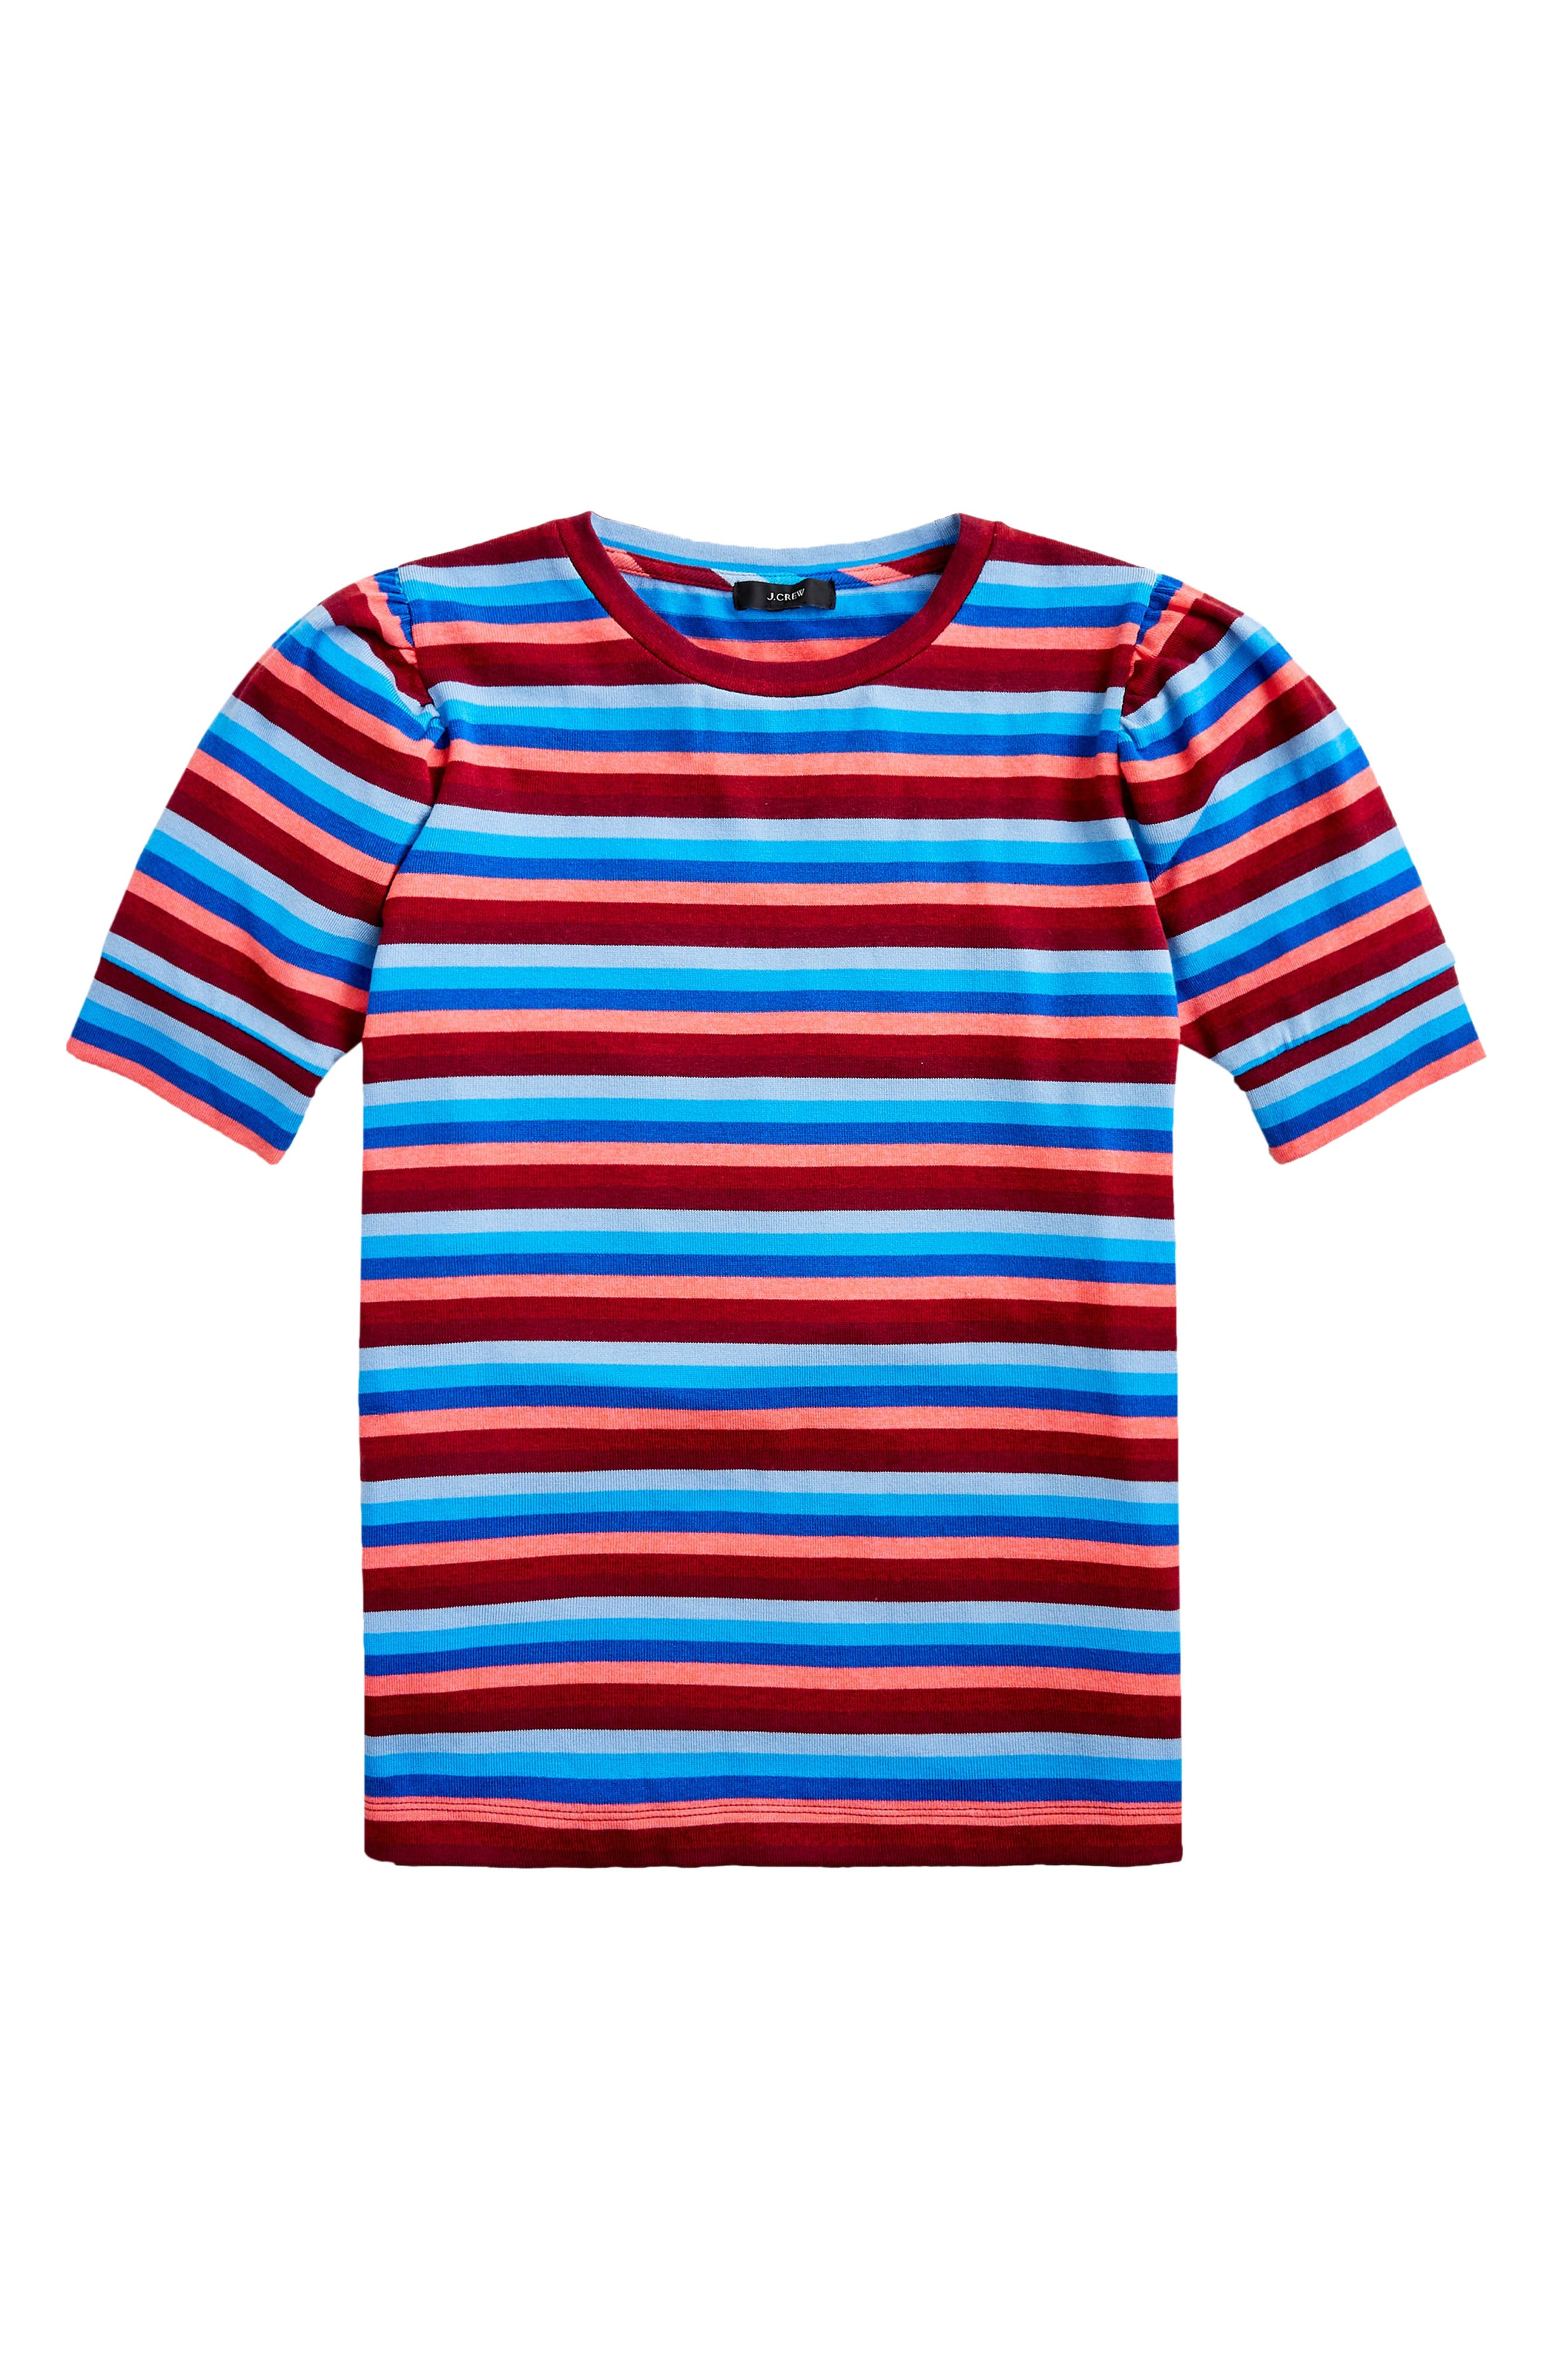 J.Crew Super Cozy Puff Sleeve Stripe Top (Regular & Plus Size) | Nordstrom